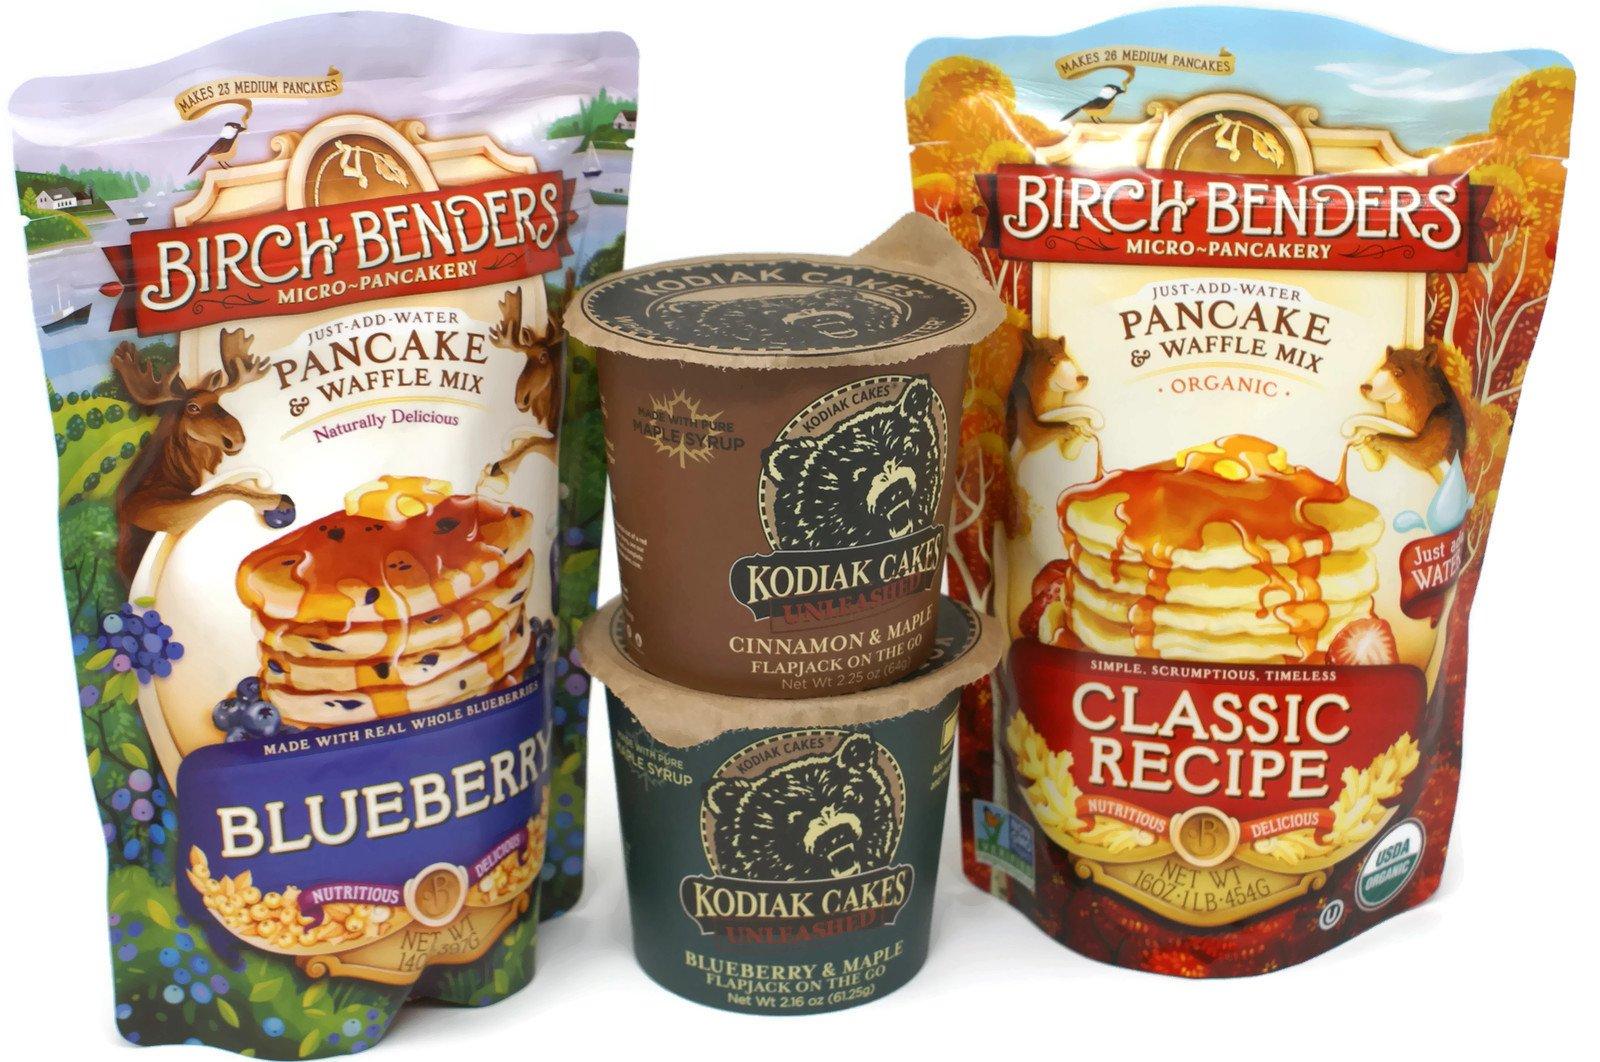 Variety Pack - Birch Benders Organic Pancake & Waffle Mix - Classic (16 oz), Blueberry (14 oz) - Kodiak Cakes Unleashed Flapjack on the Go - Blueberry & Maple (2.16 oz), Cinnamon & Maple (2.25 oz)